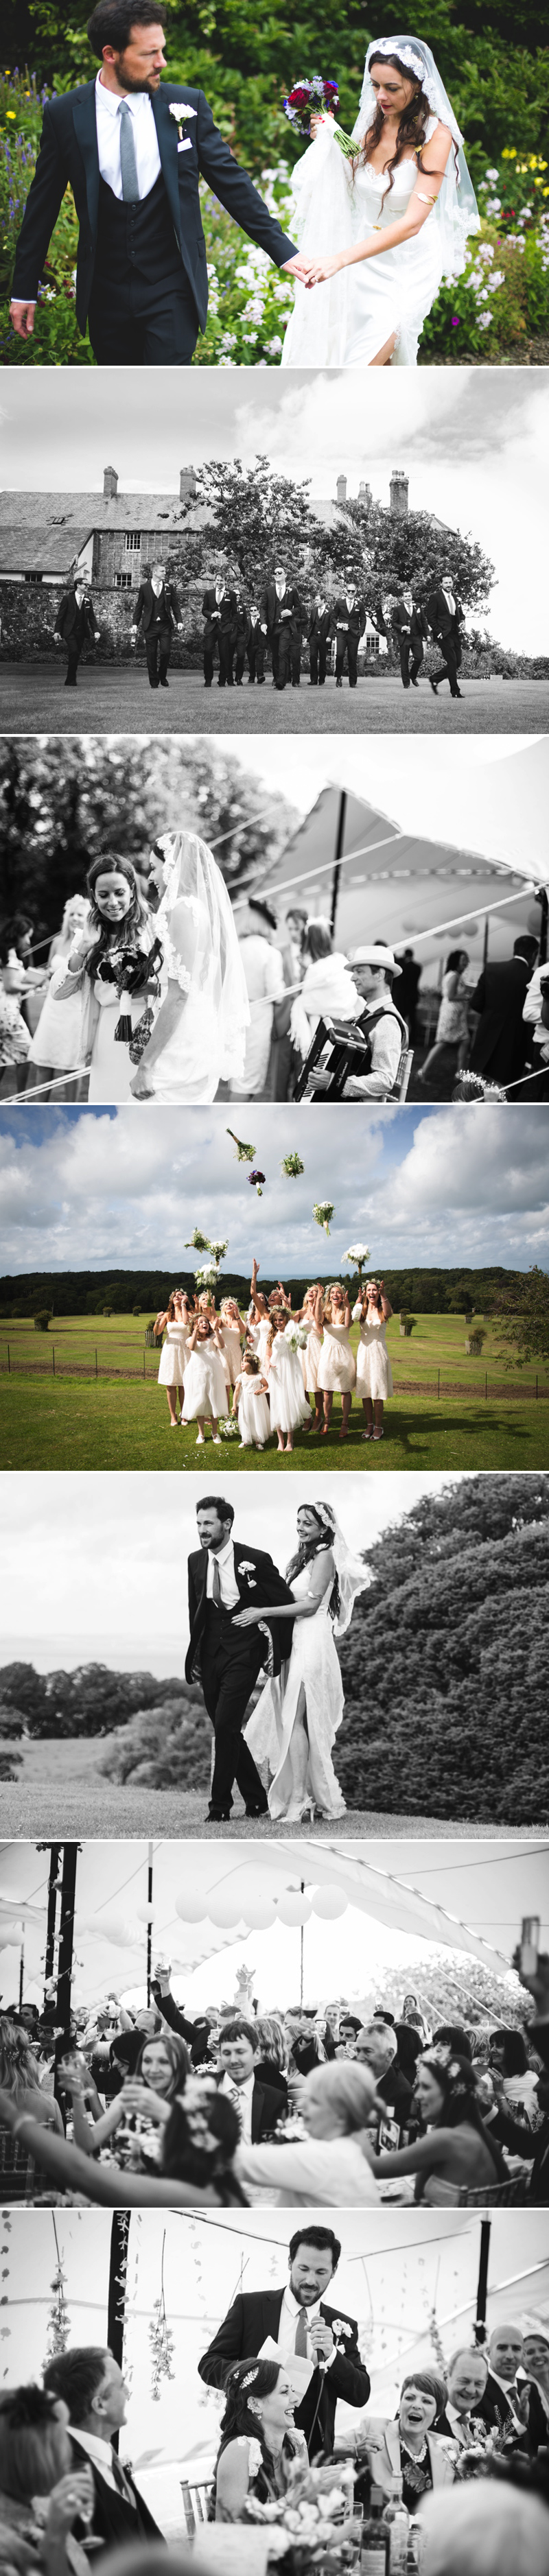 wedding-venues-in-devon-clovelly-village-weddings-003